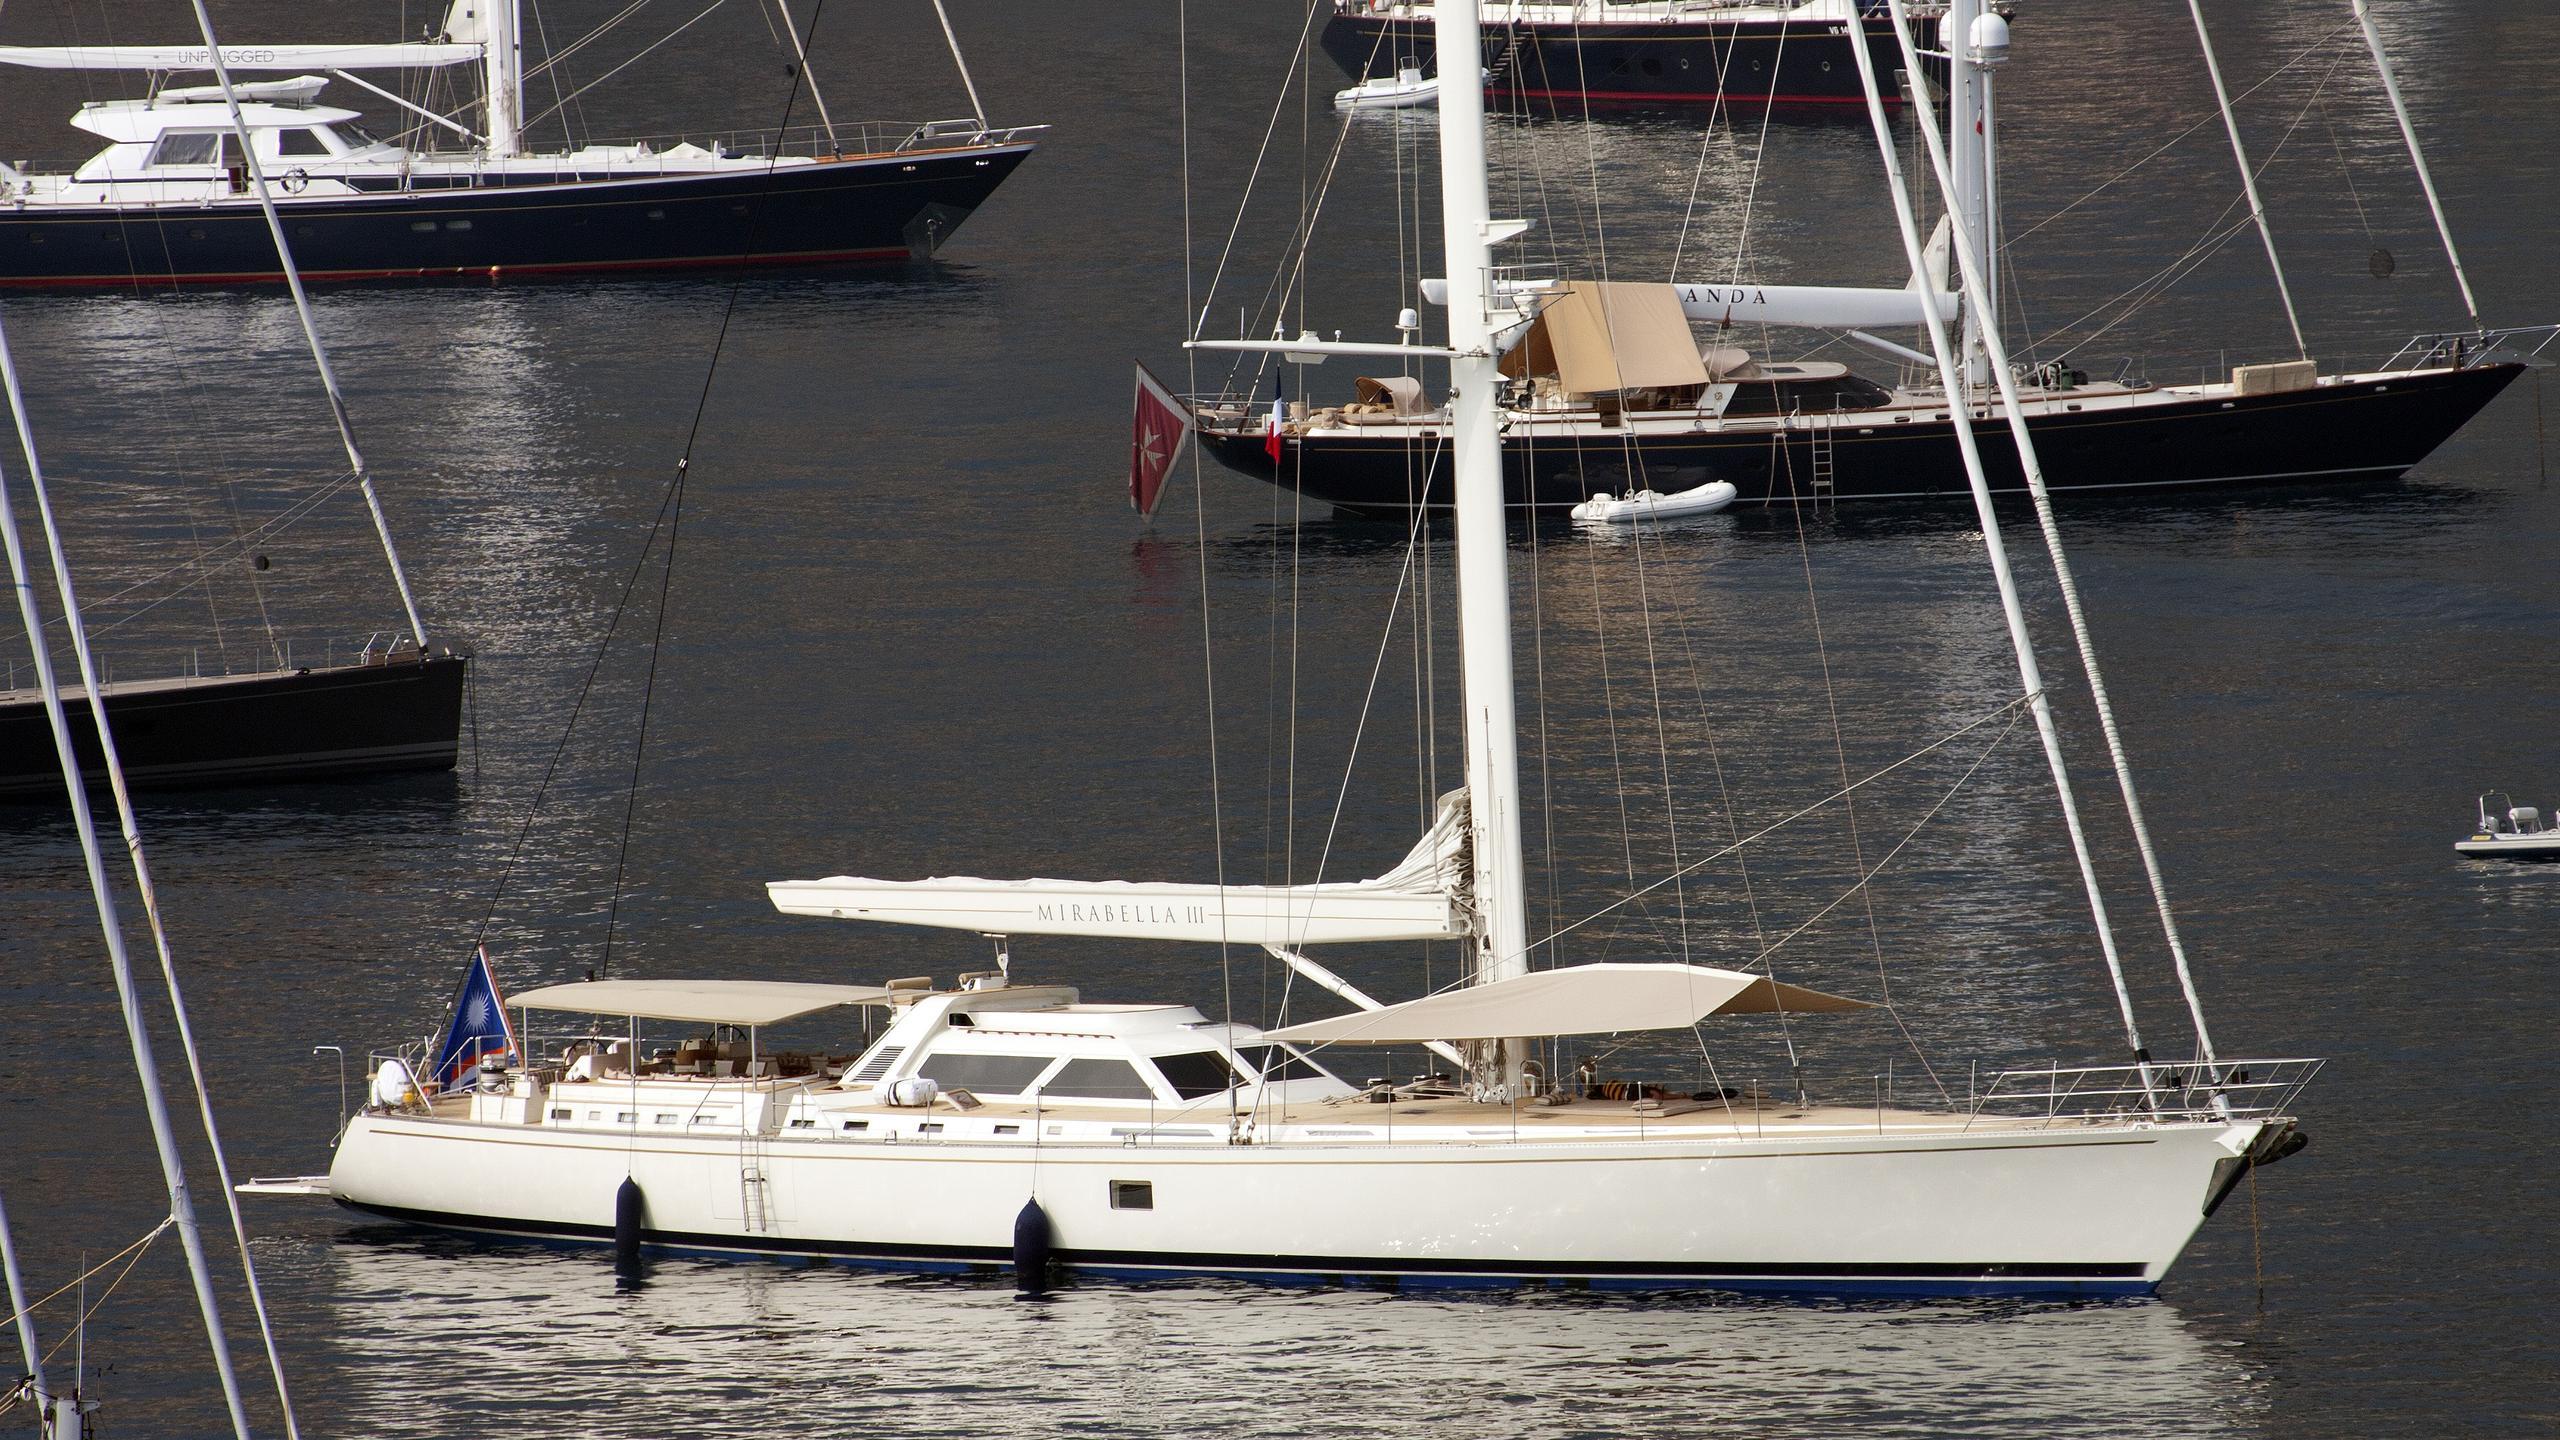 mirabella-iii-yacht-exterior